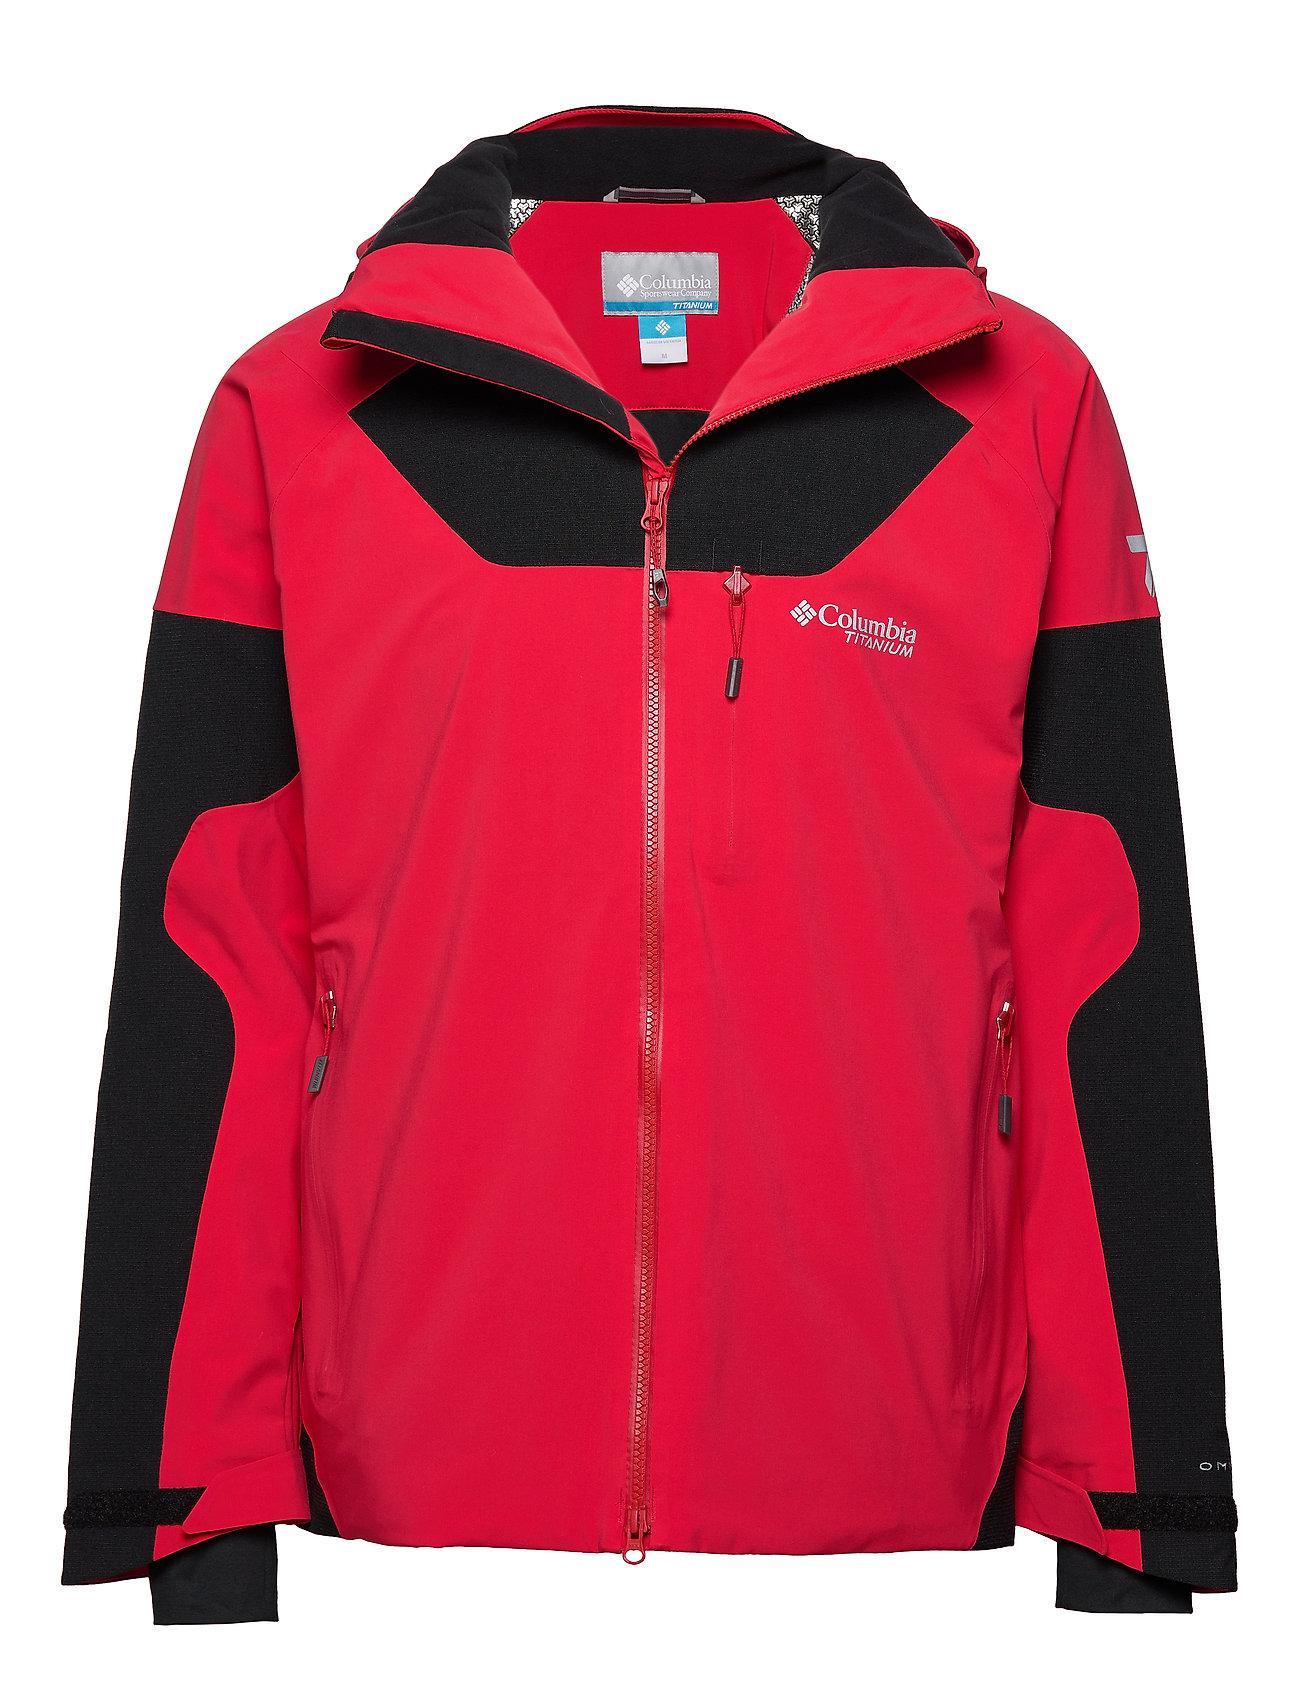 Columbia Powder Keg III Jacket - MOUNTAIN RED, BLACK